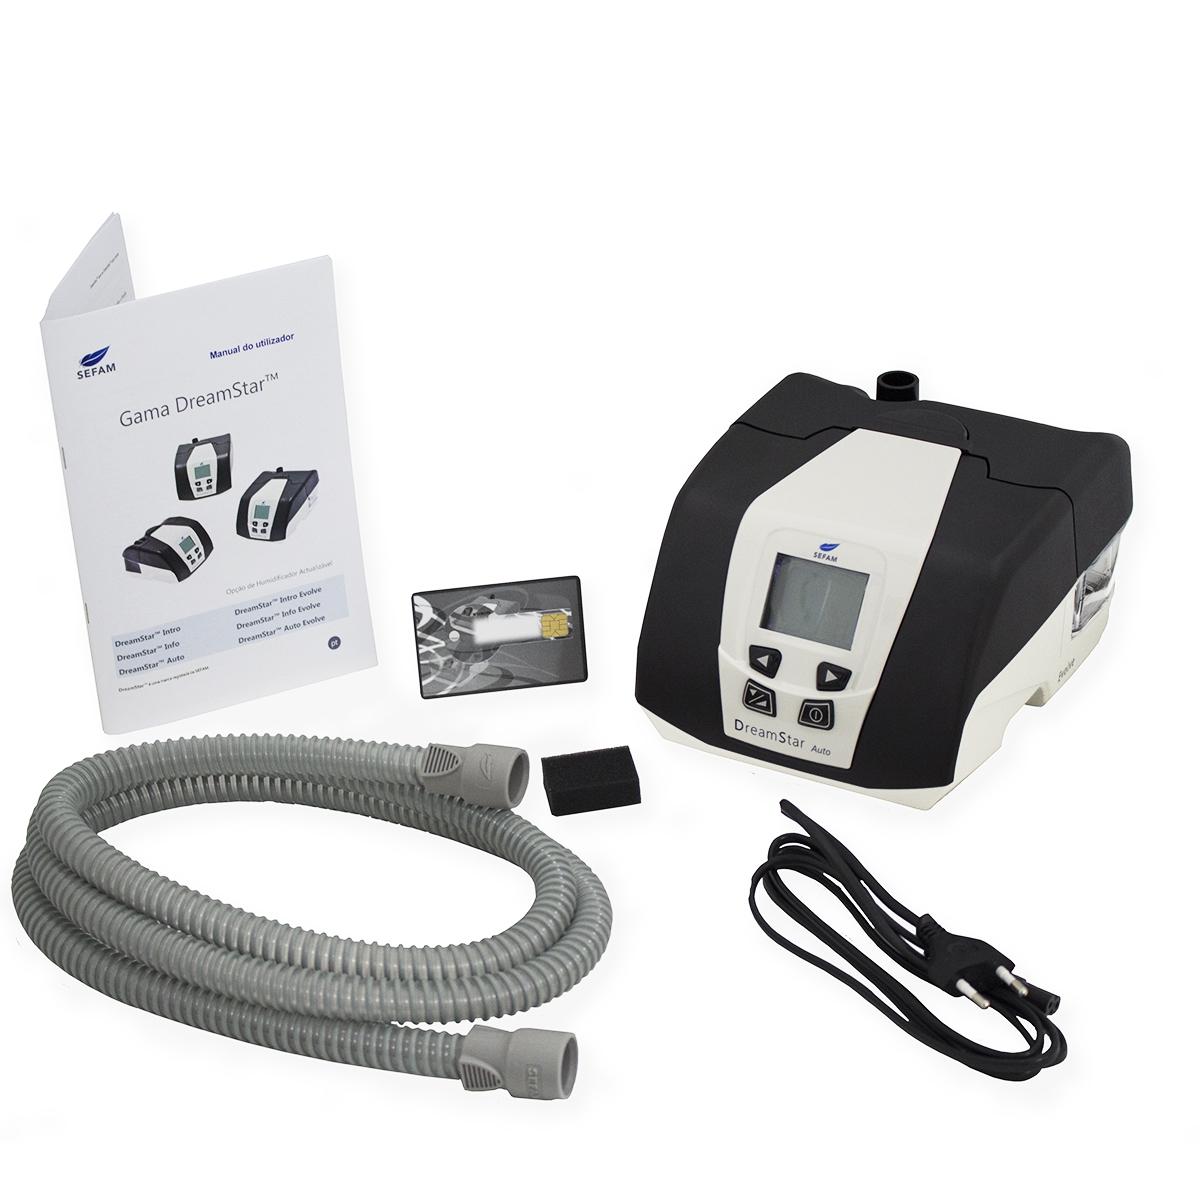 Cpap DreamStar Auto συσκευή άπνοιας 0811000 - Roi Medicals